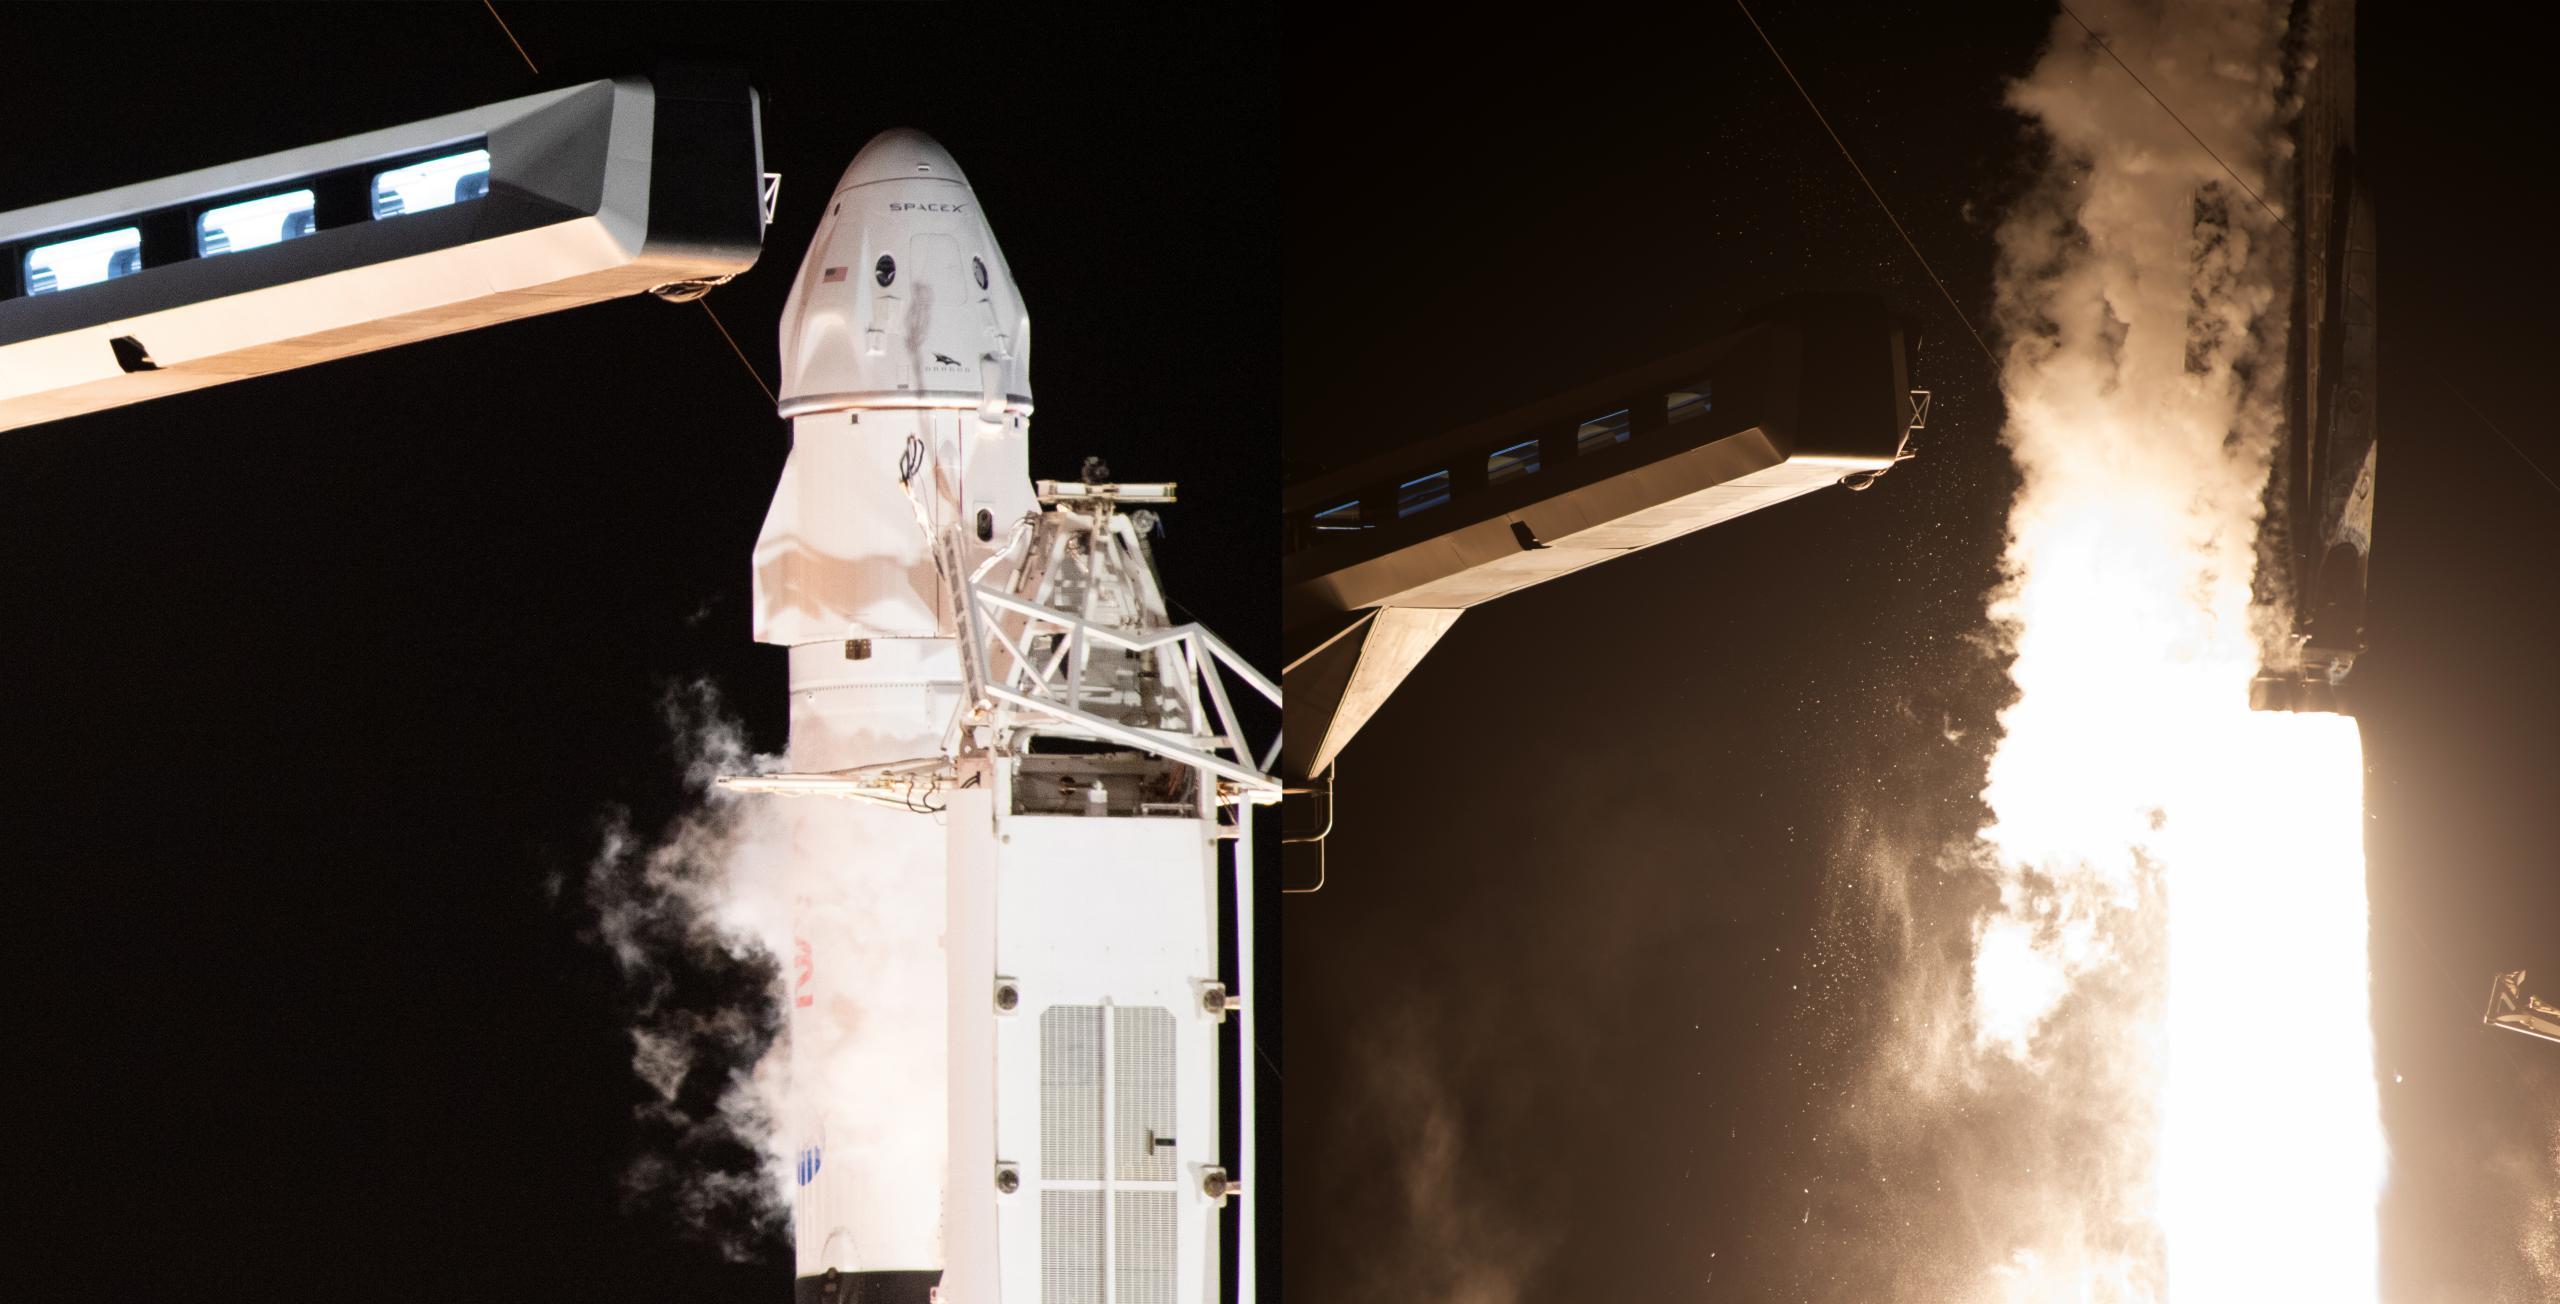 Crew-2 Crew Dragon C206 Falcon 9 B1061 39A 042321 (NASA) launch panel (c)